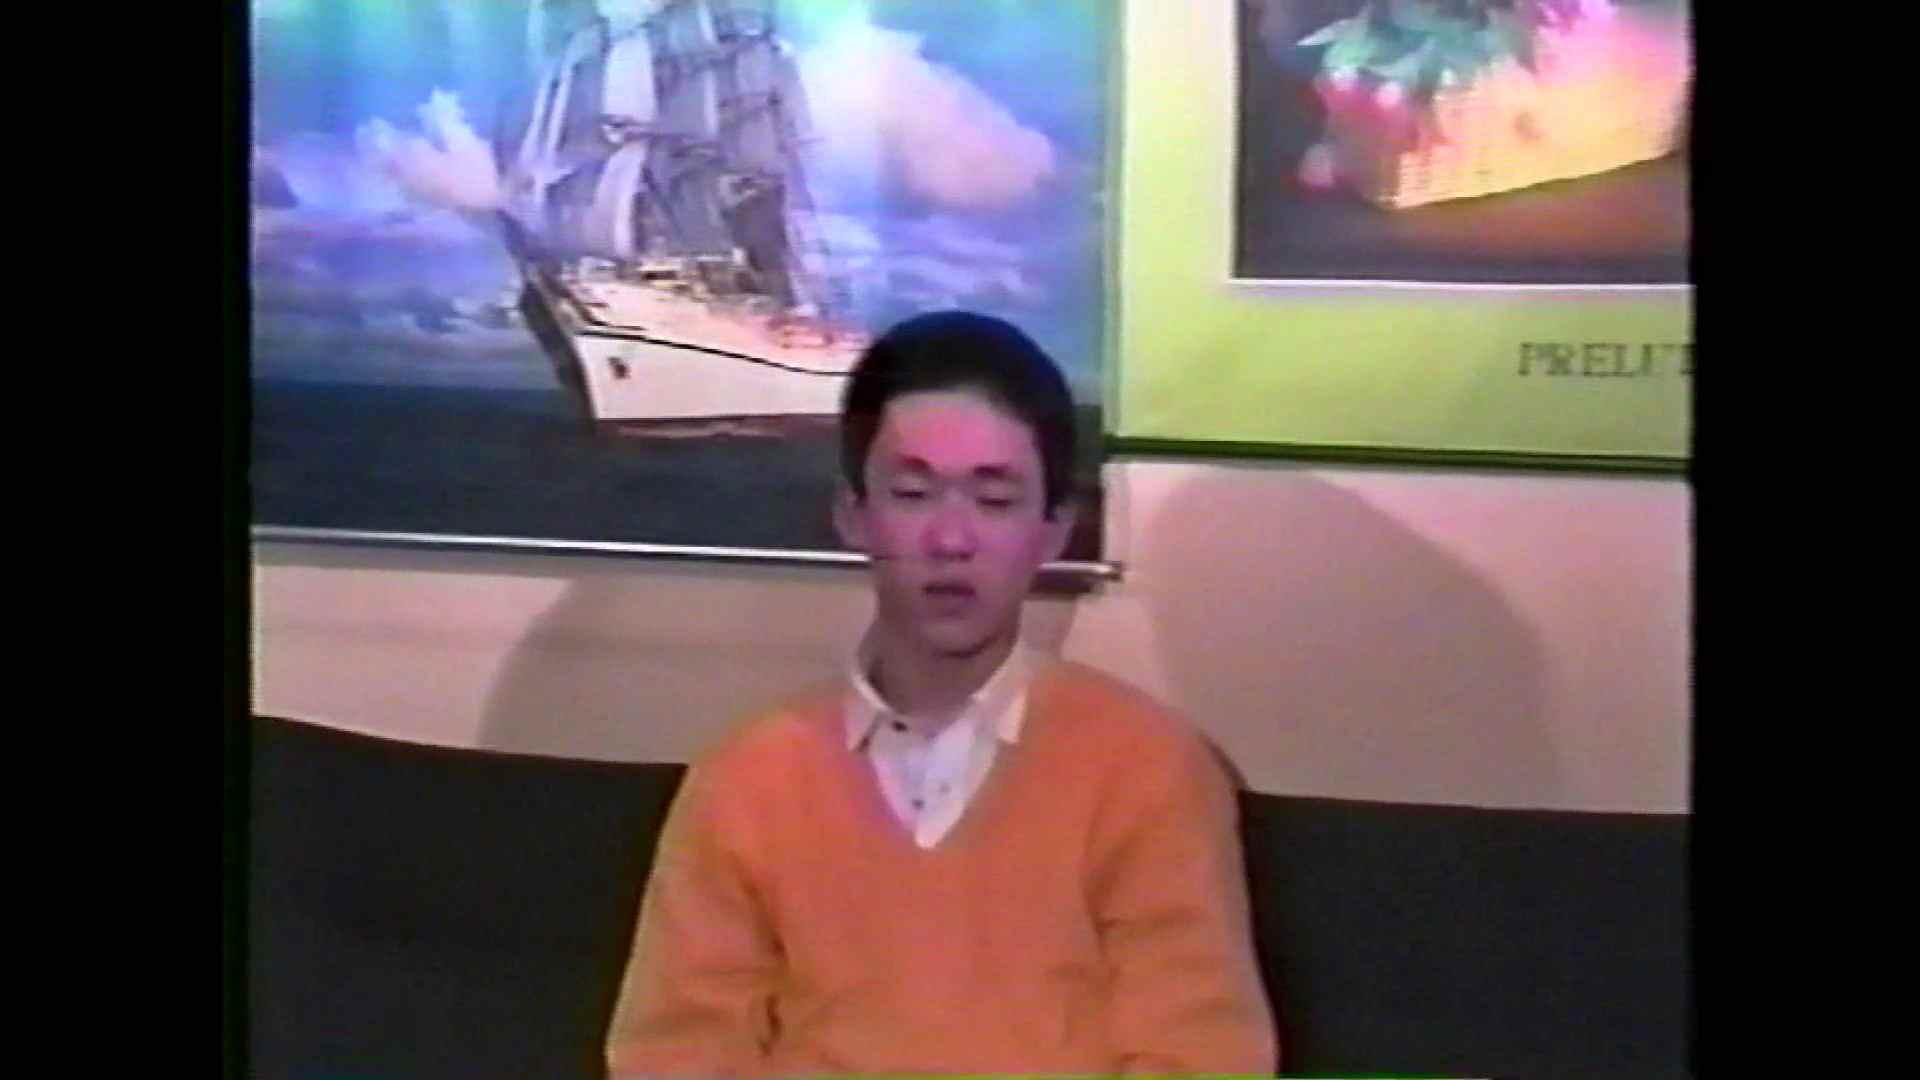 GAYBOY宏のオカズ倉庫Vol.2-1 ノンケ  89pic